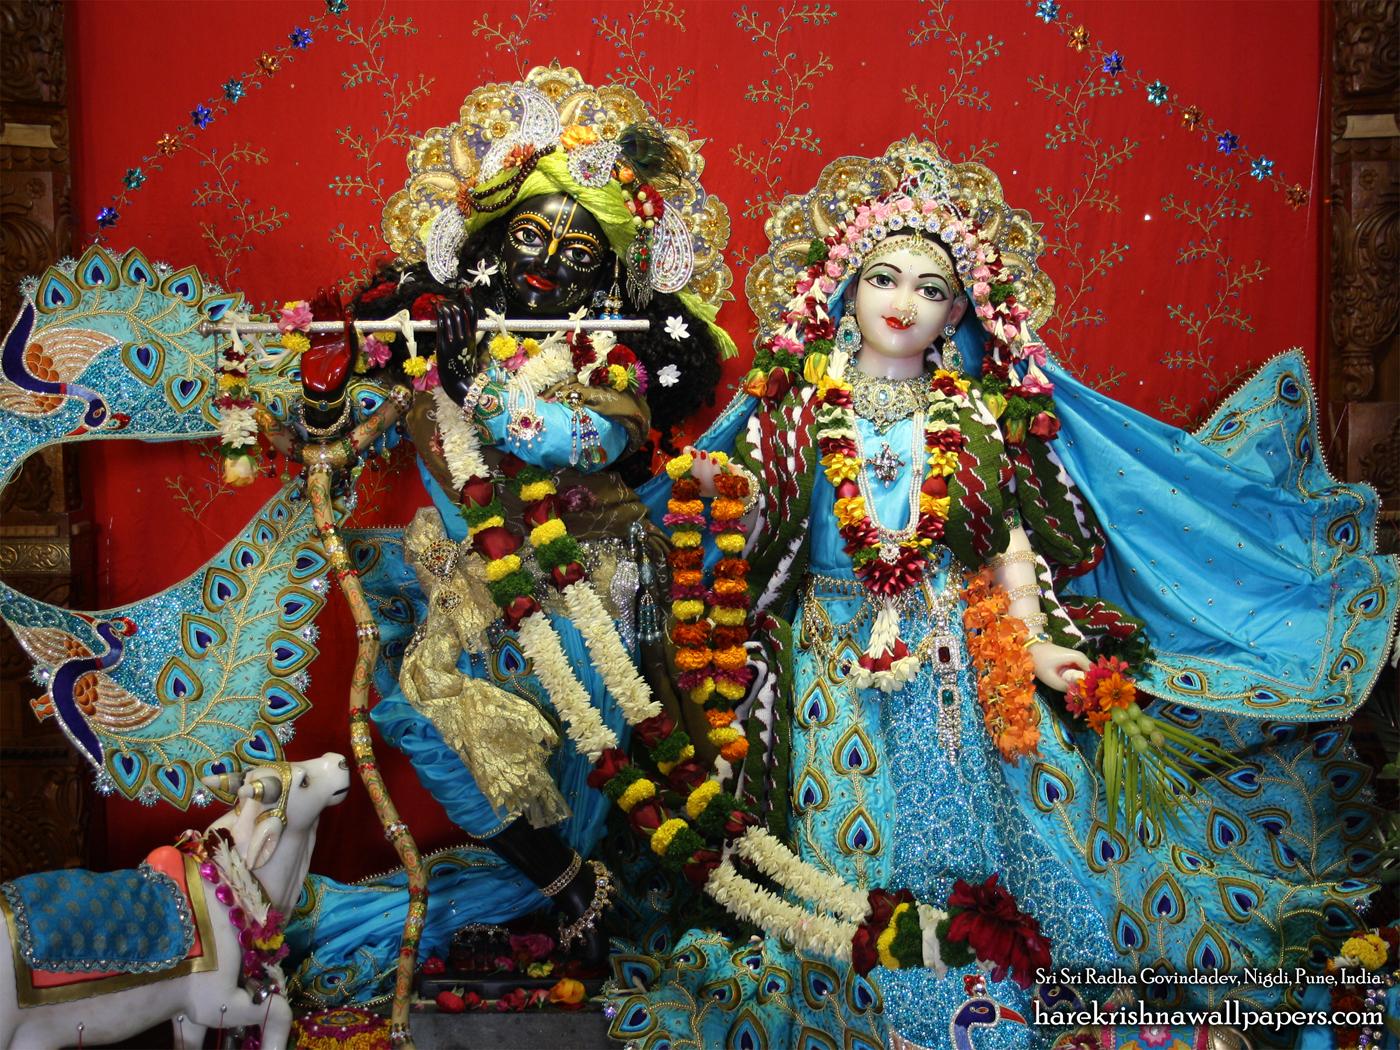 Sri Sri Radha Govind Wallpaper (033) Size 1400x1050 Download